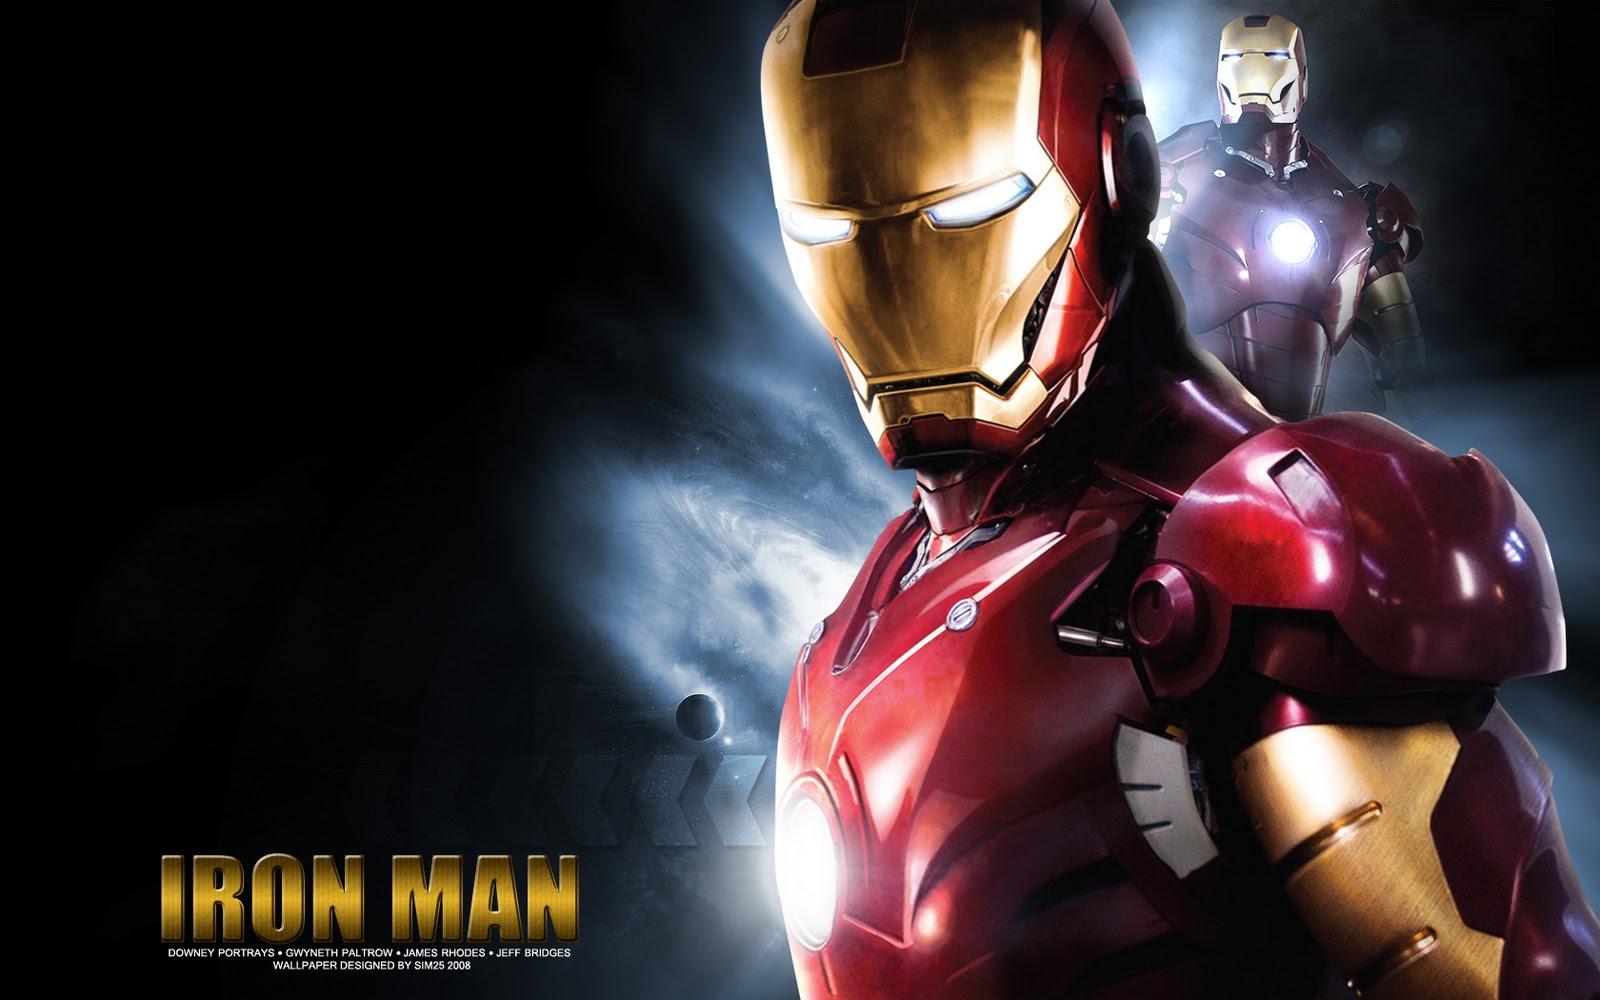 http://2.bp.blogspot.com/-fHpgeXu0k64/Tt0f0CEpGLI/AAAAAAAAOb4/UKjHOm8fGUs/s1600/Iron_Man_wallpaper_HD_by_Sim25_Design.jpg